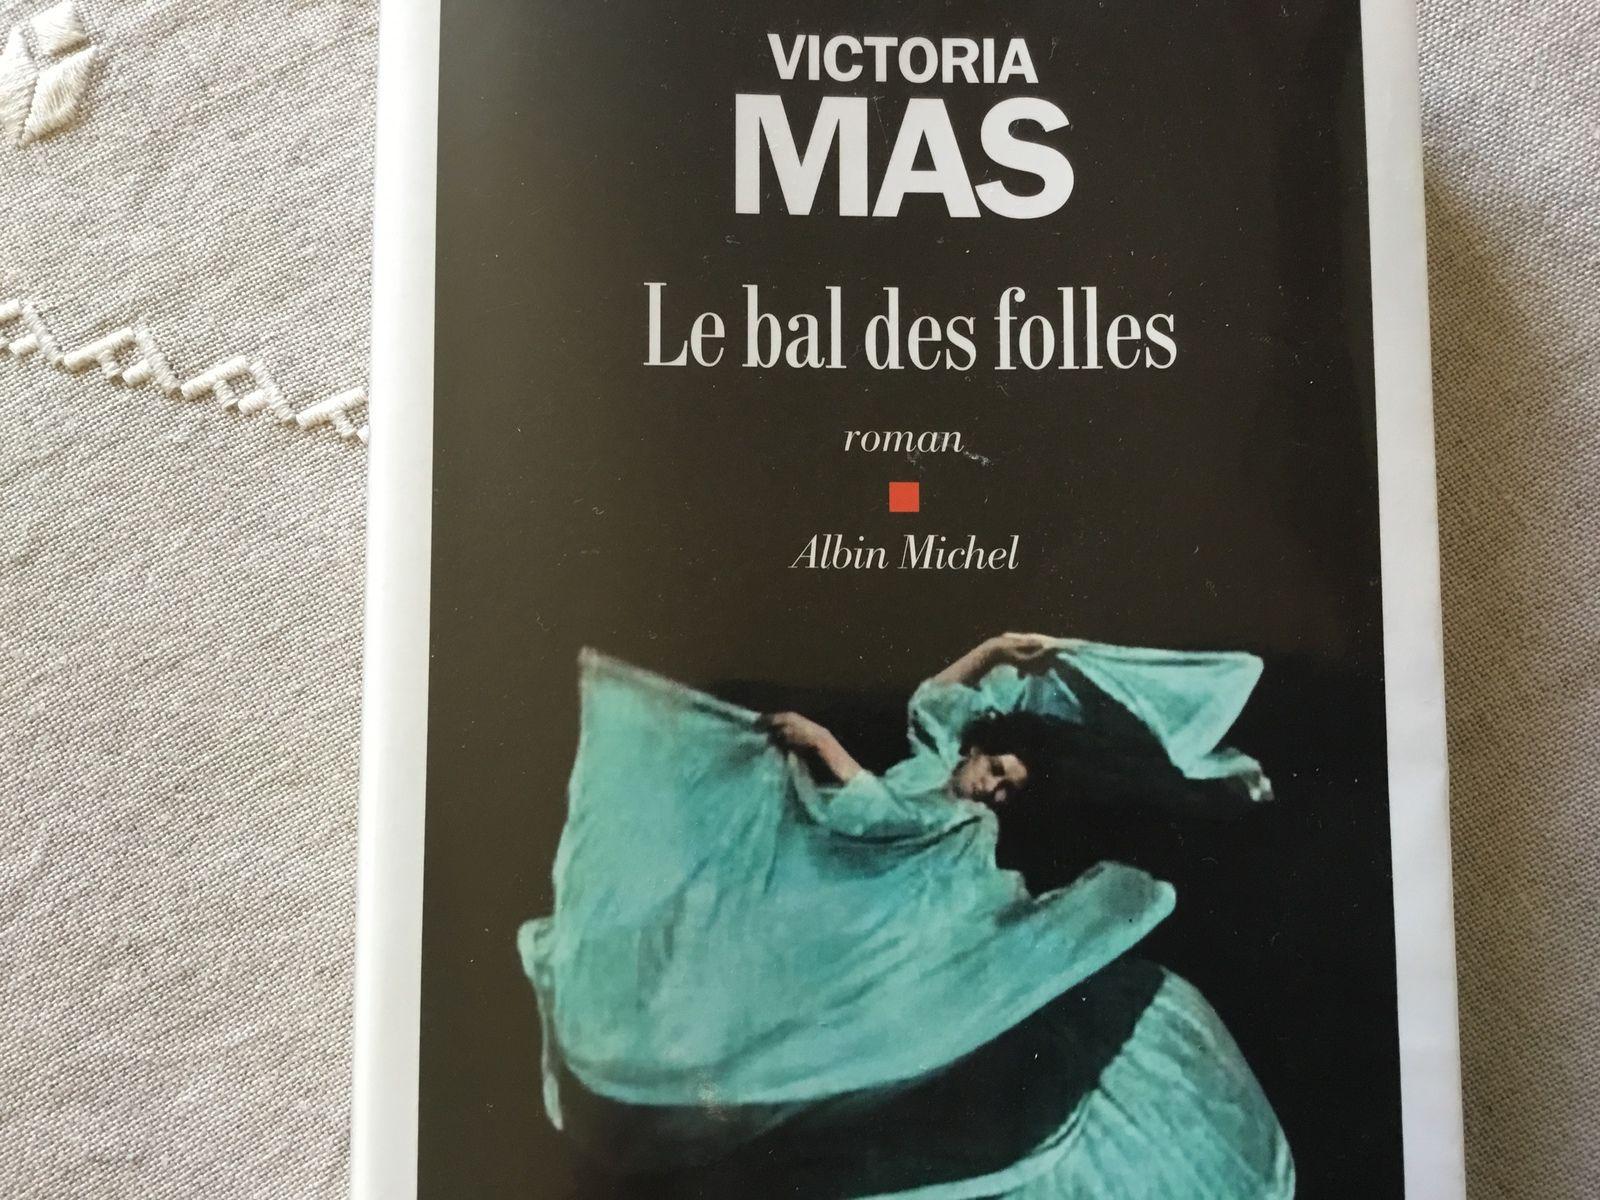 Le bal des folles roman de Victoria MAS